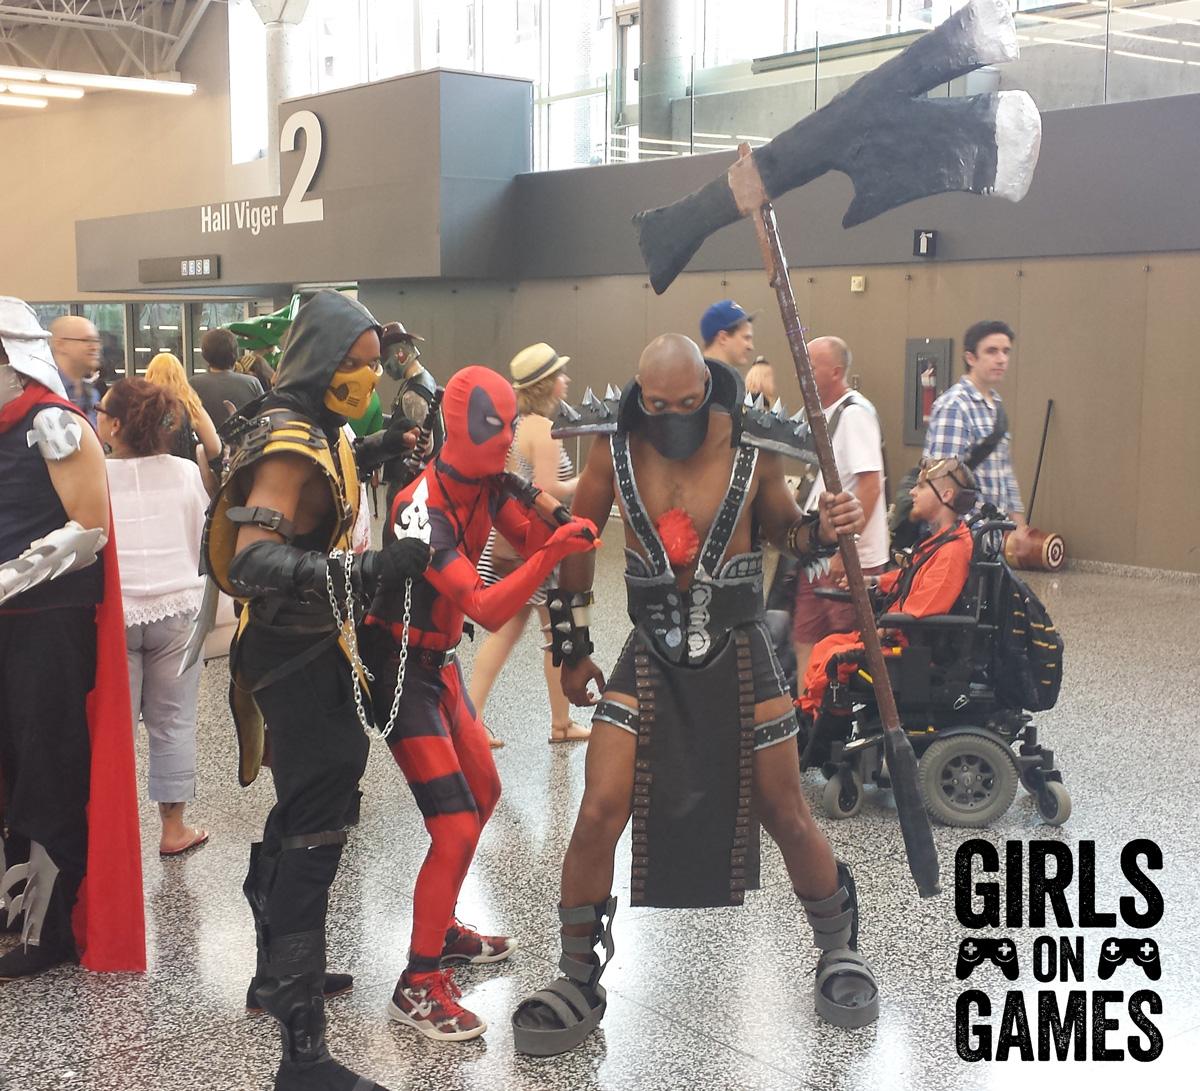 Deadpool and Mortal Kombat cosplay at Montreal Comiccon 2015. Photo © Nicholas MacDonald / Girls on Games